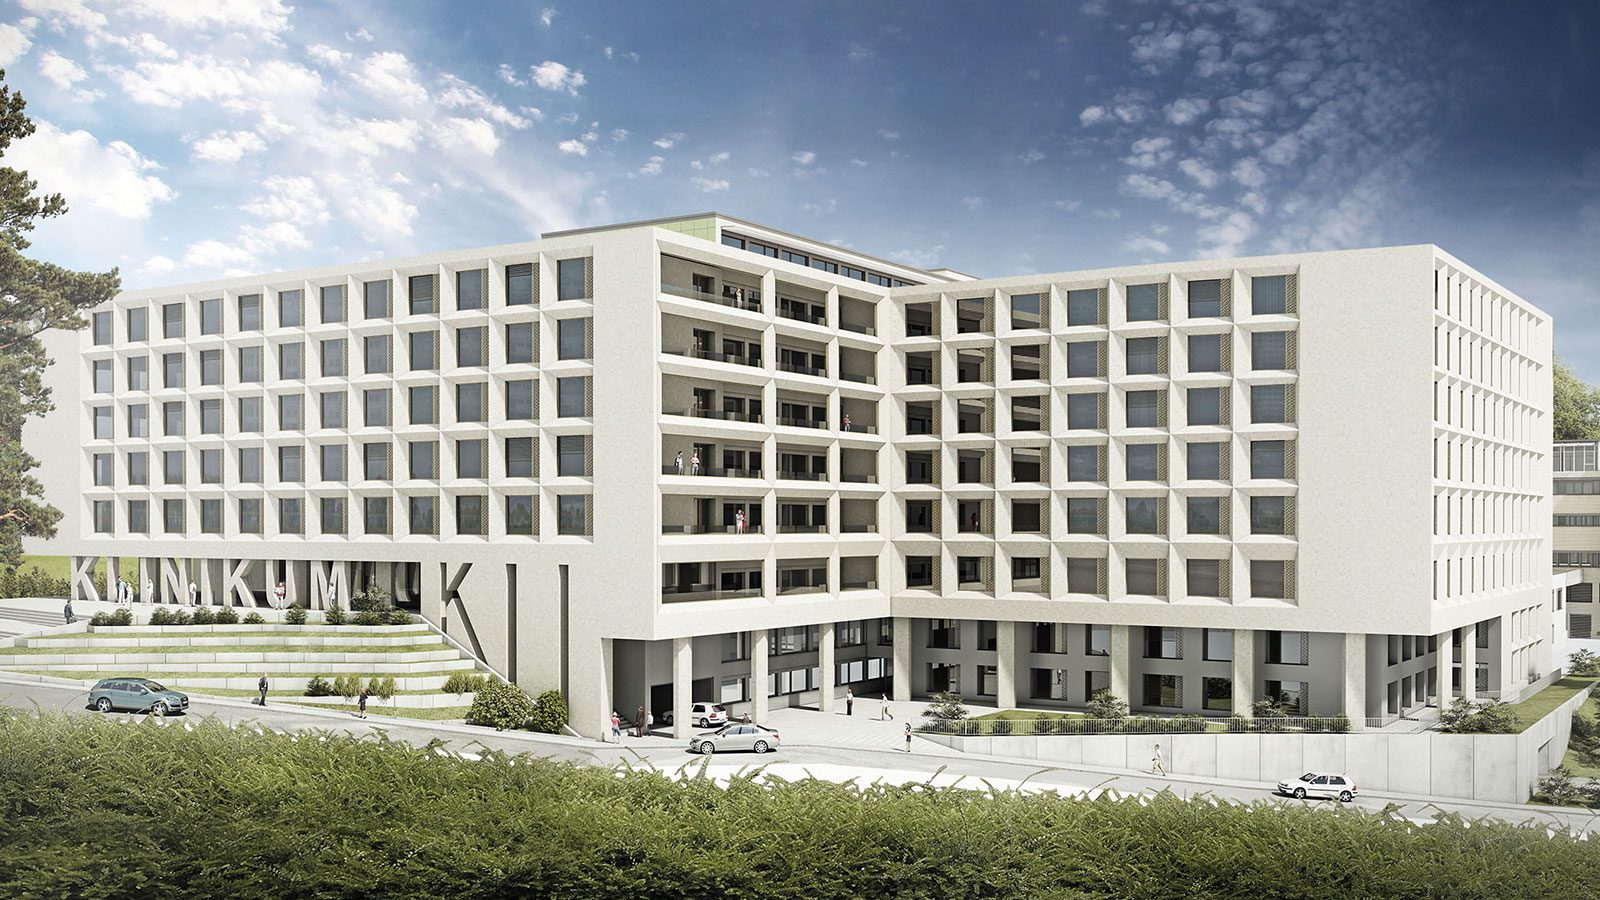 h2m-architekten-klinikum-kulmbach